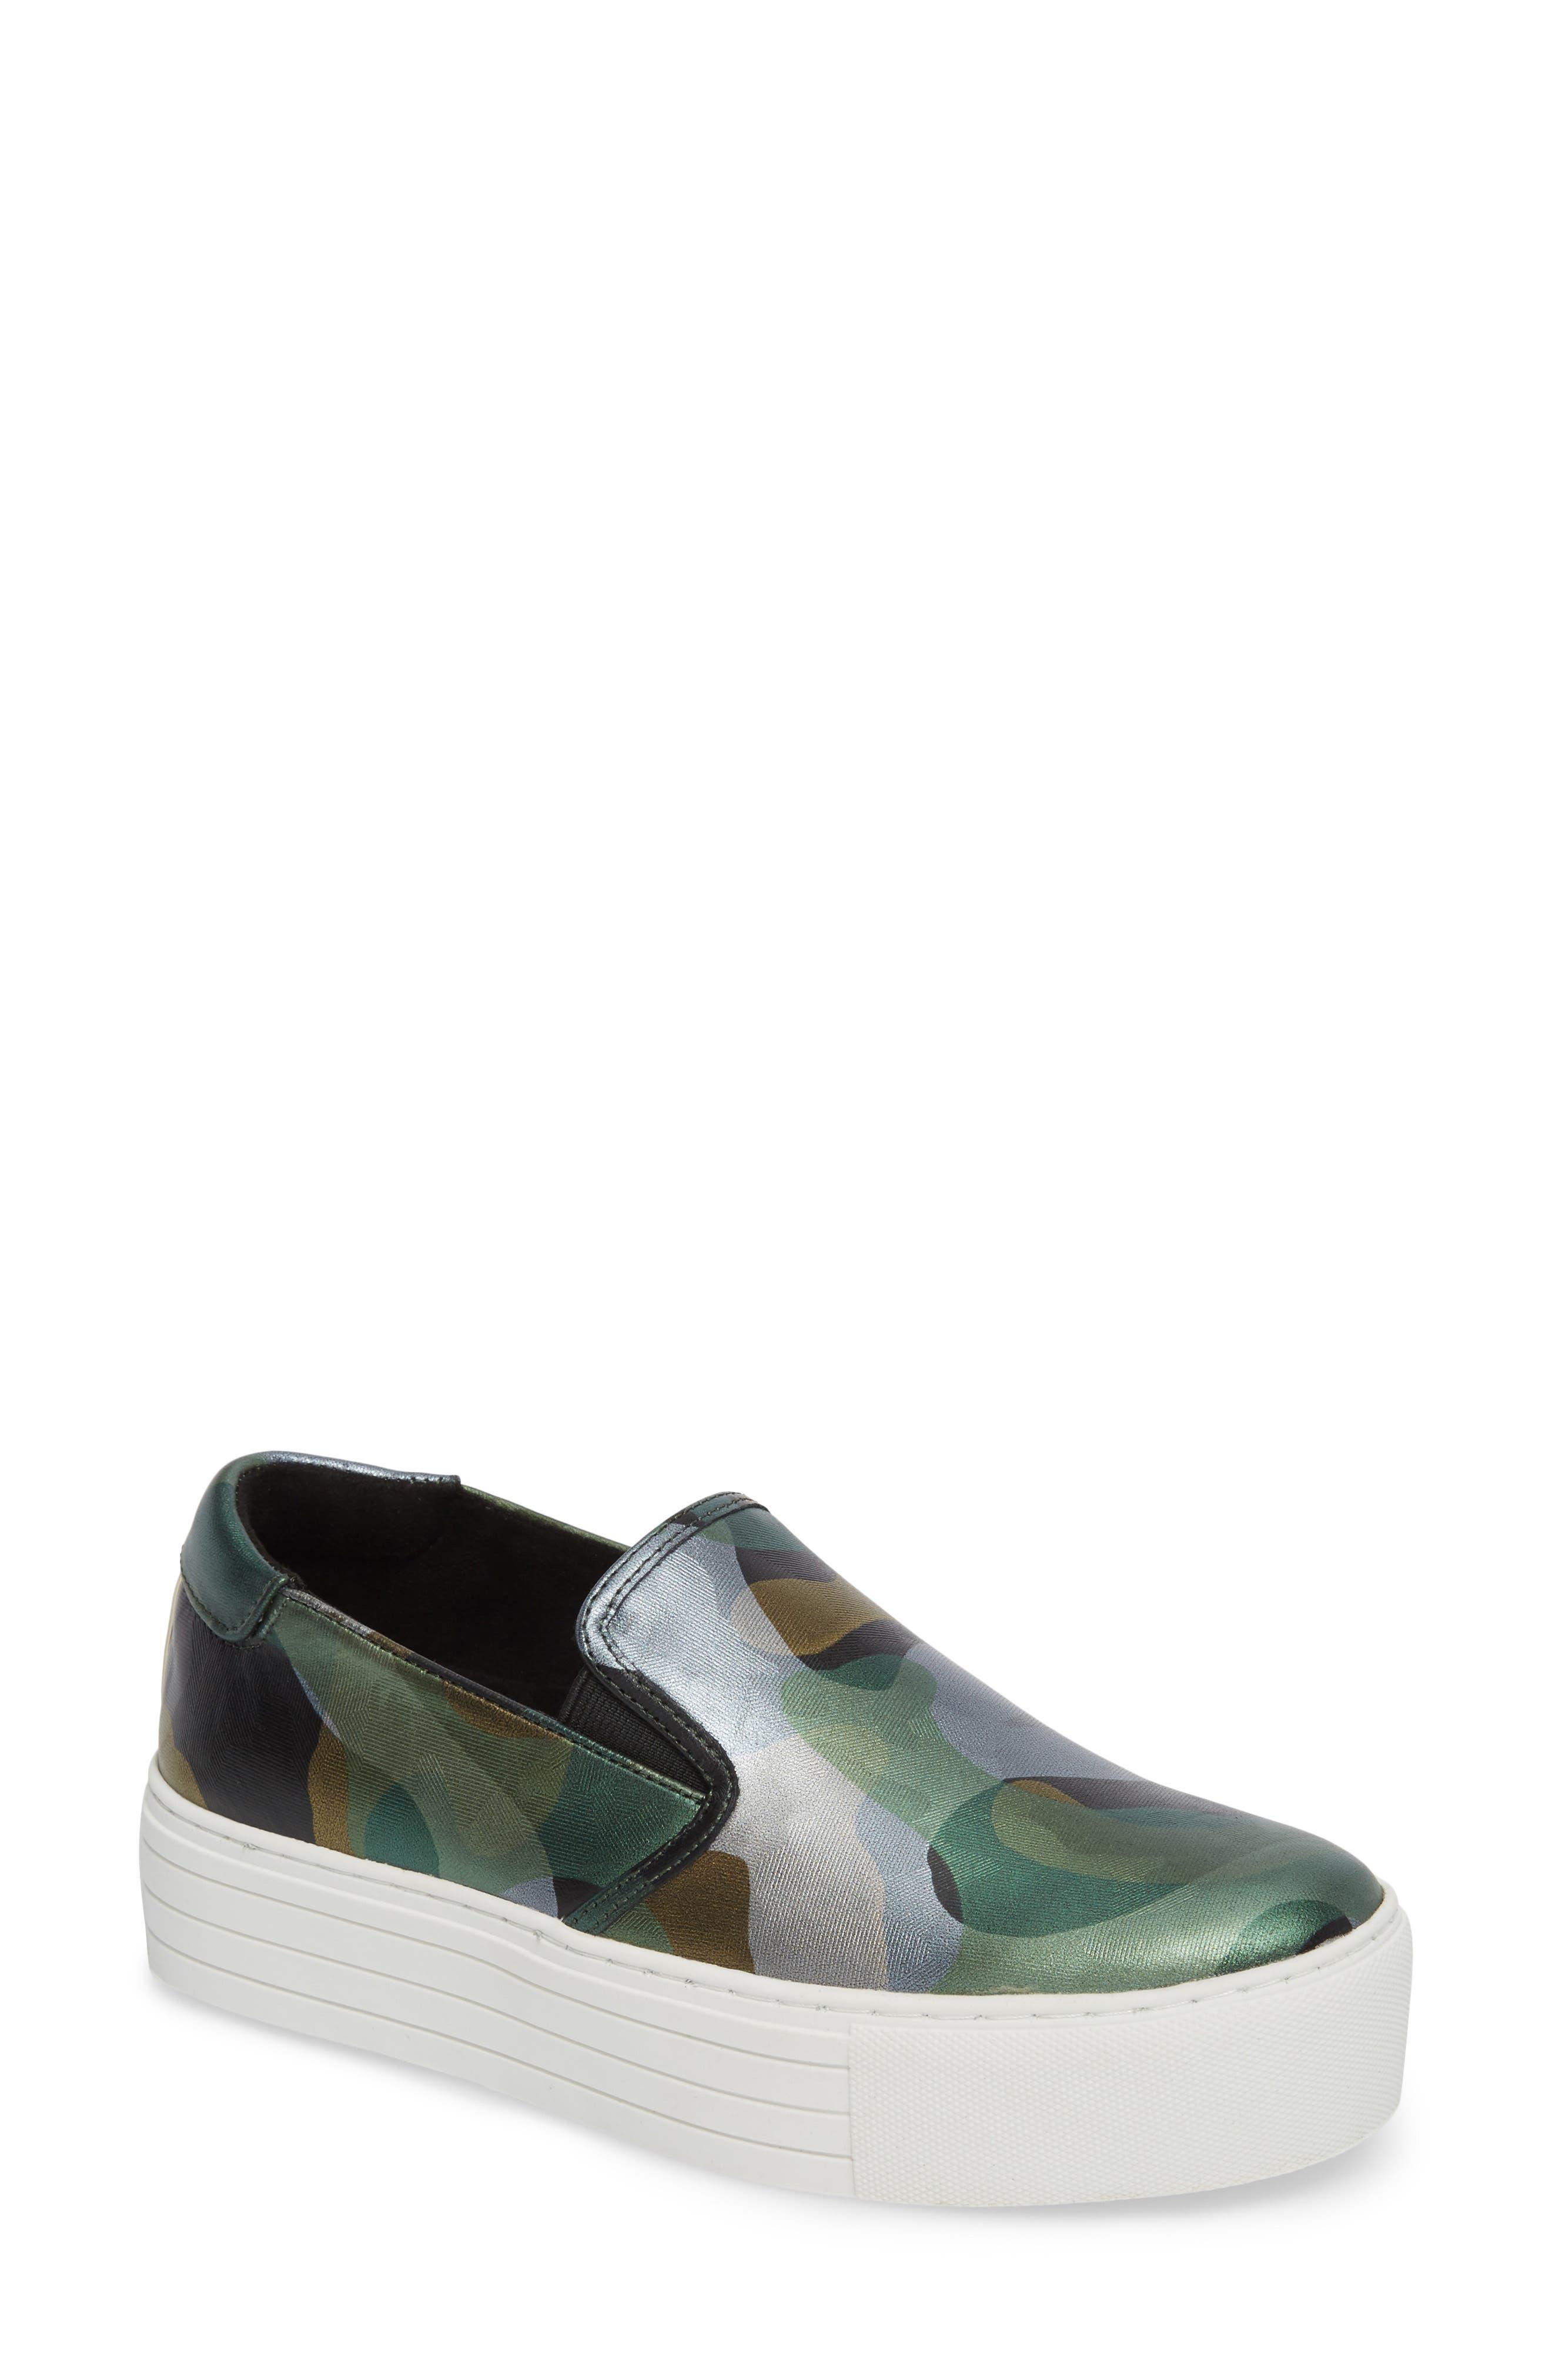 Main Image - Kenneth Cole New York Joanie Slip-On Platform Sneaker (Women)